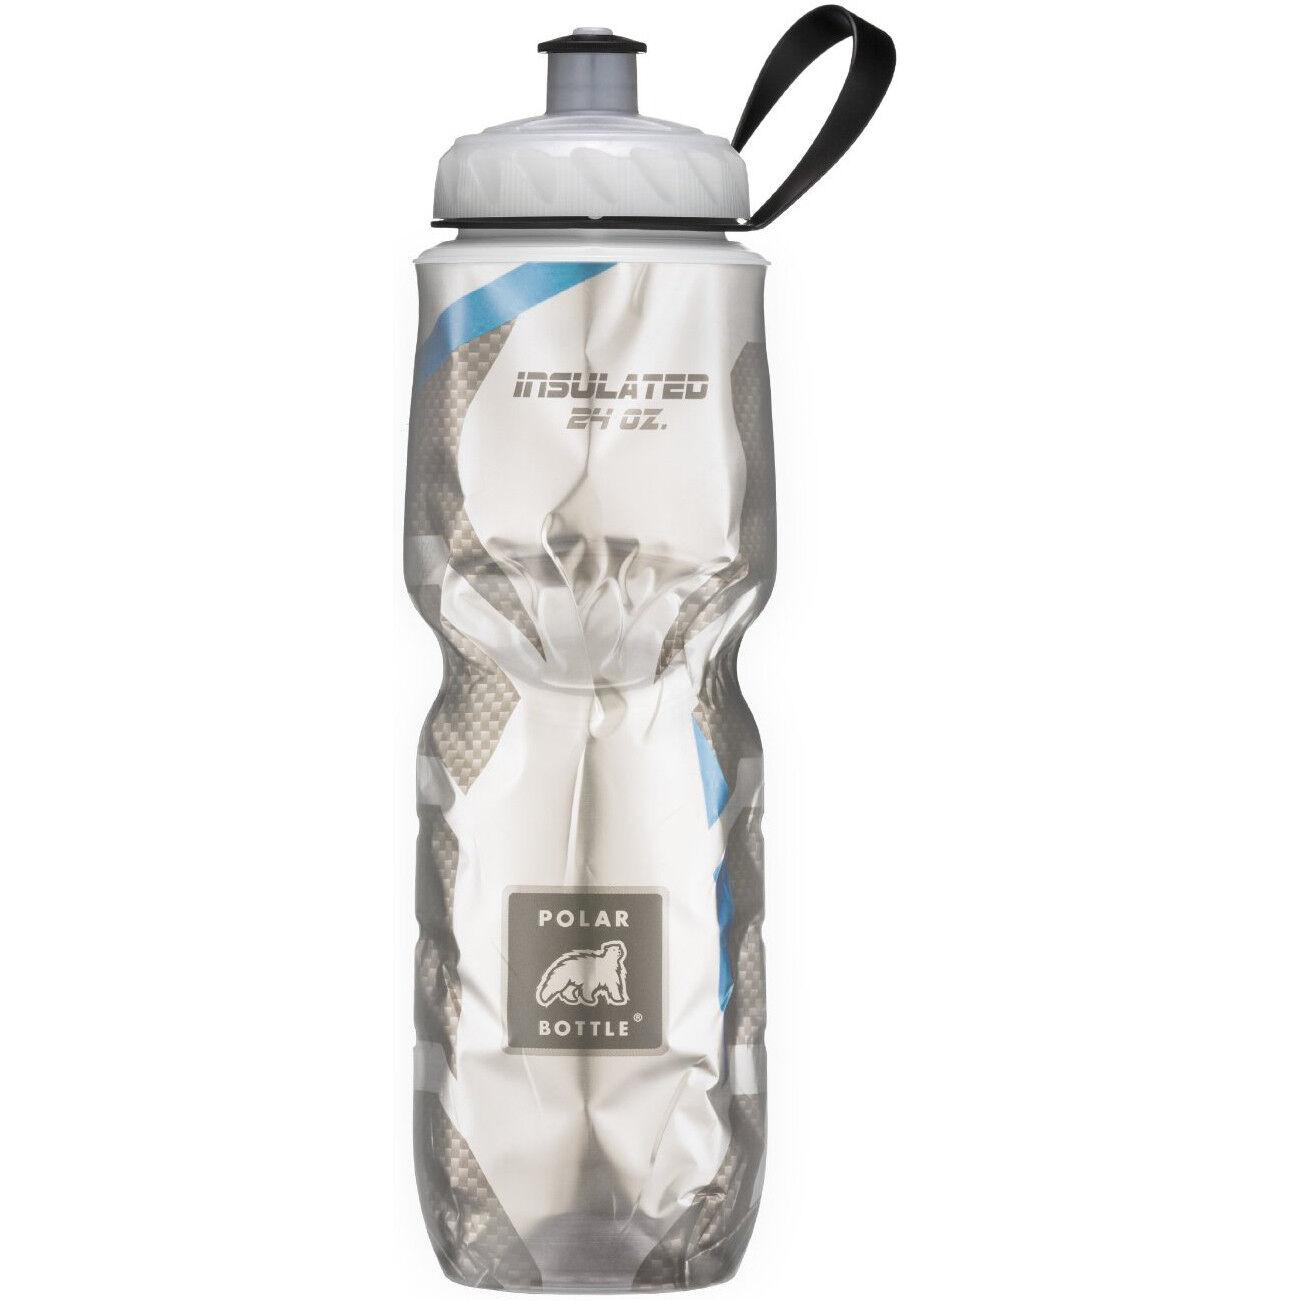 Polar Bottle Insulated Water Bottle 24 oz - 100% BPA-Free Cy